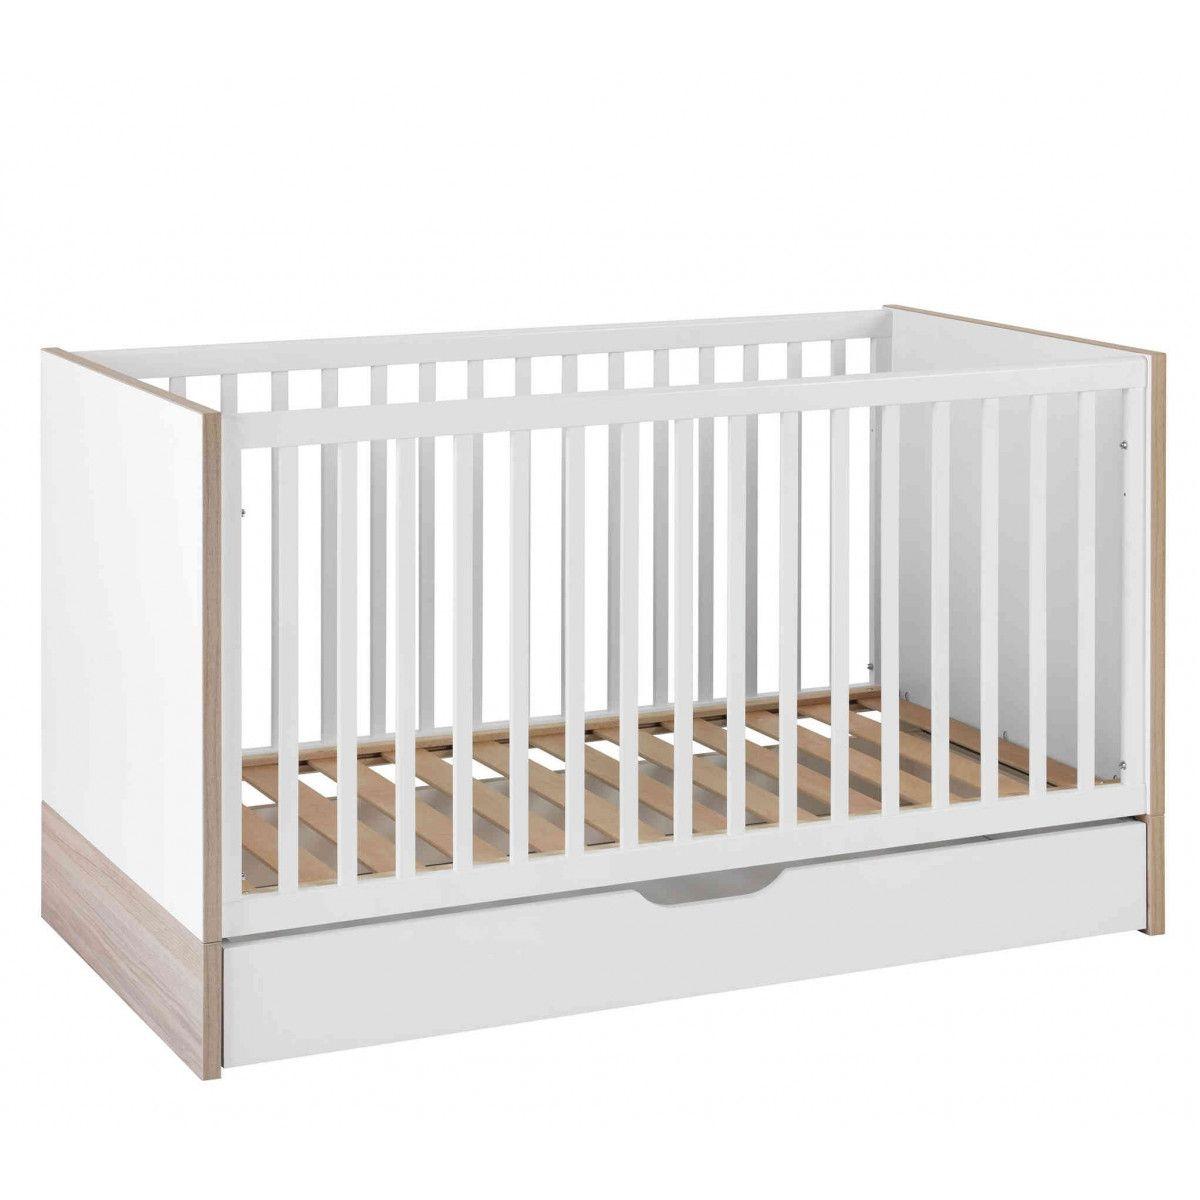 Lit bébé évolutif Lilo 70x140   tiroir de lit - Galipette